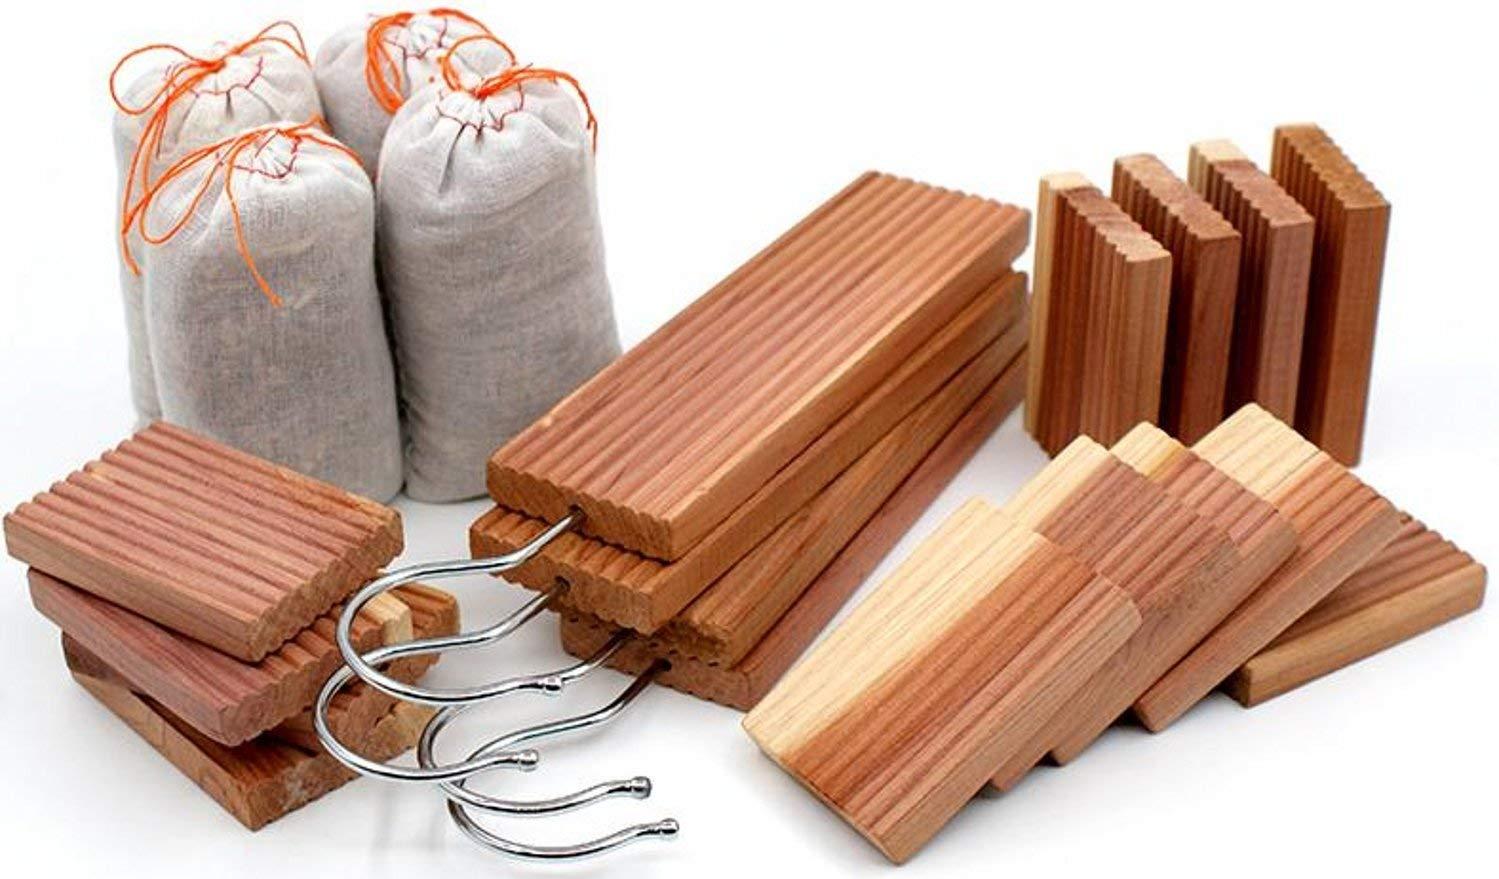 Venxic 20 Pack Moth Repellent Cedar Closet Protection Cedarwood Hangups Blocks Sachets Set